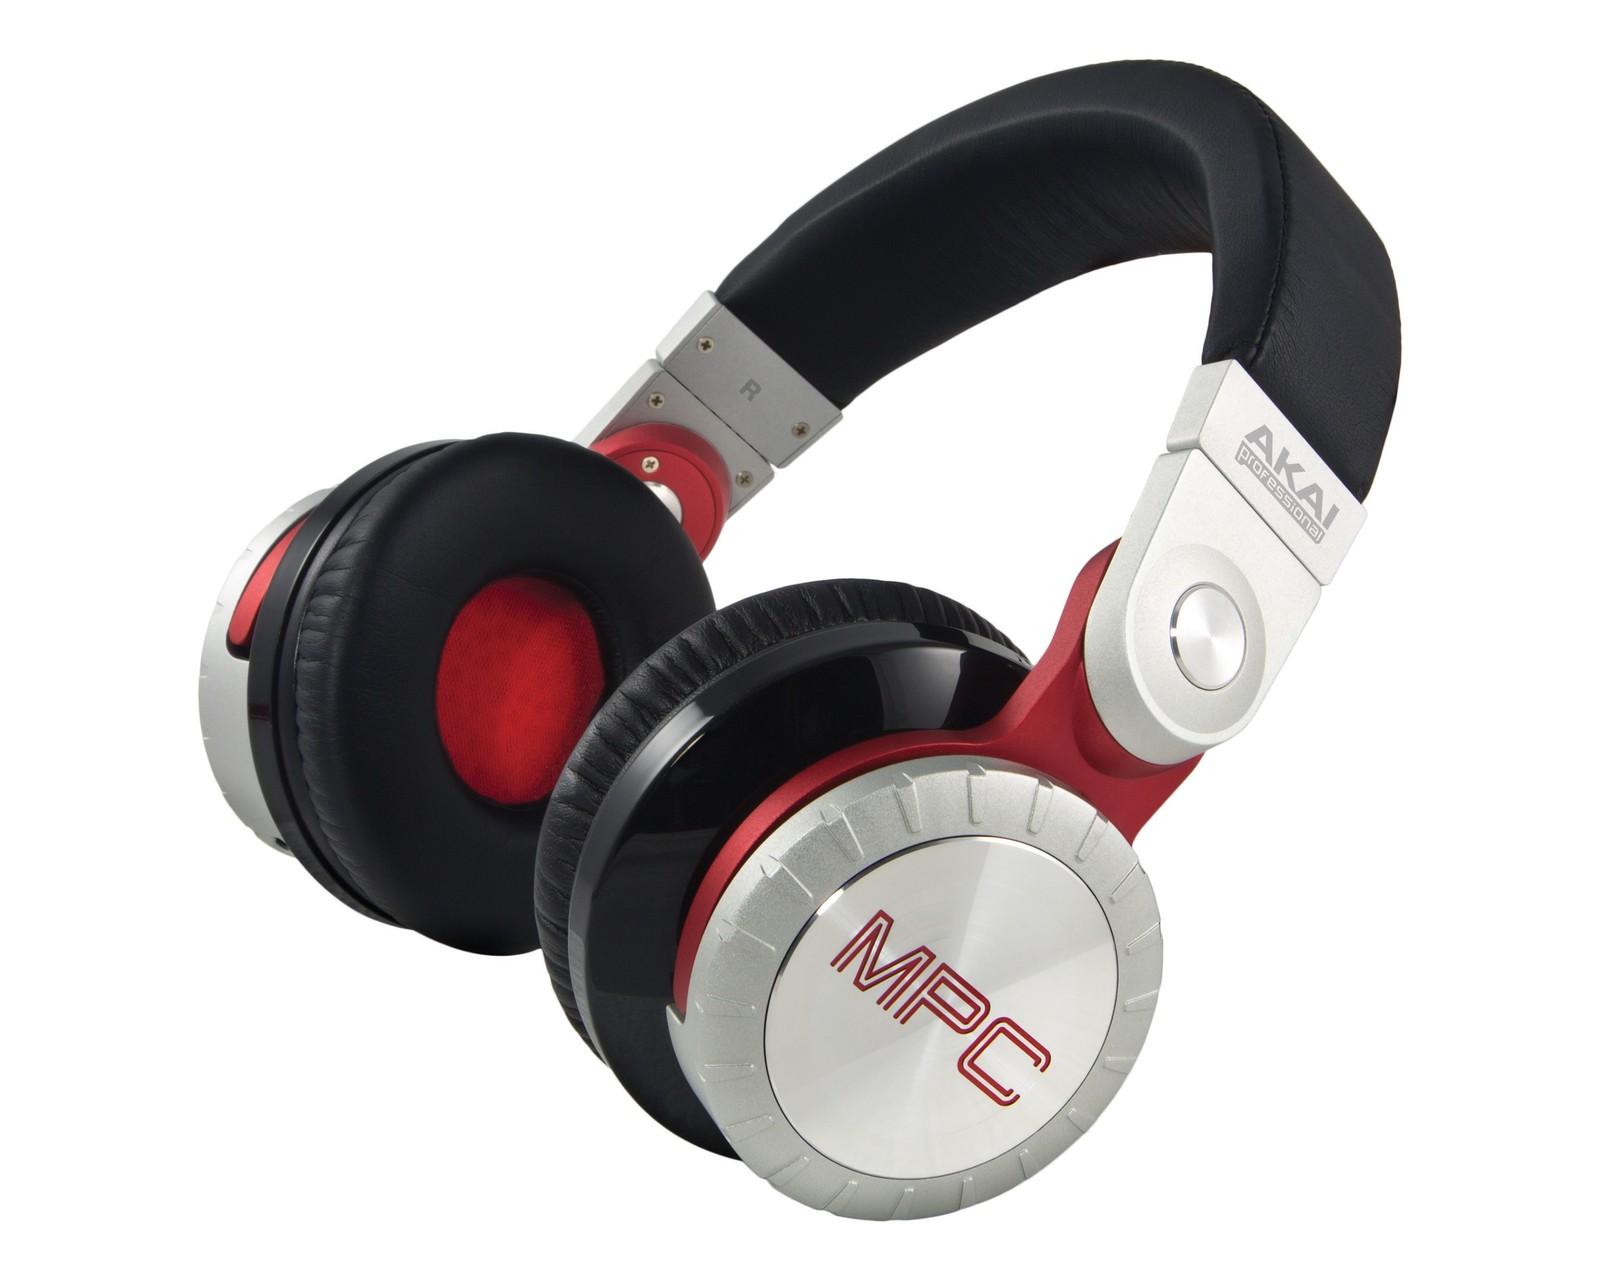 Akai Professional Mpc Headphones And Earbuds